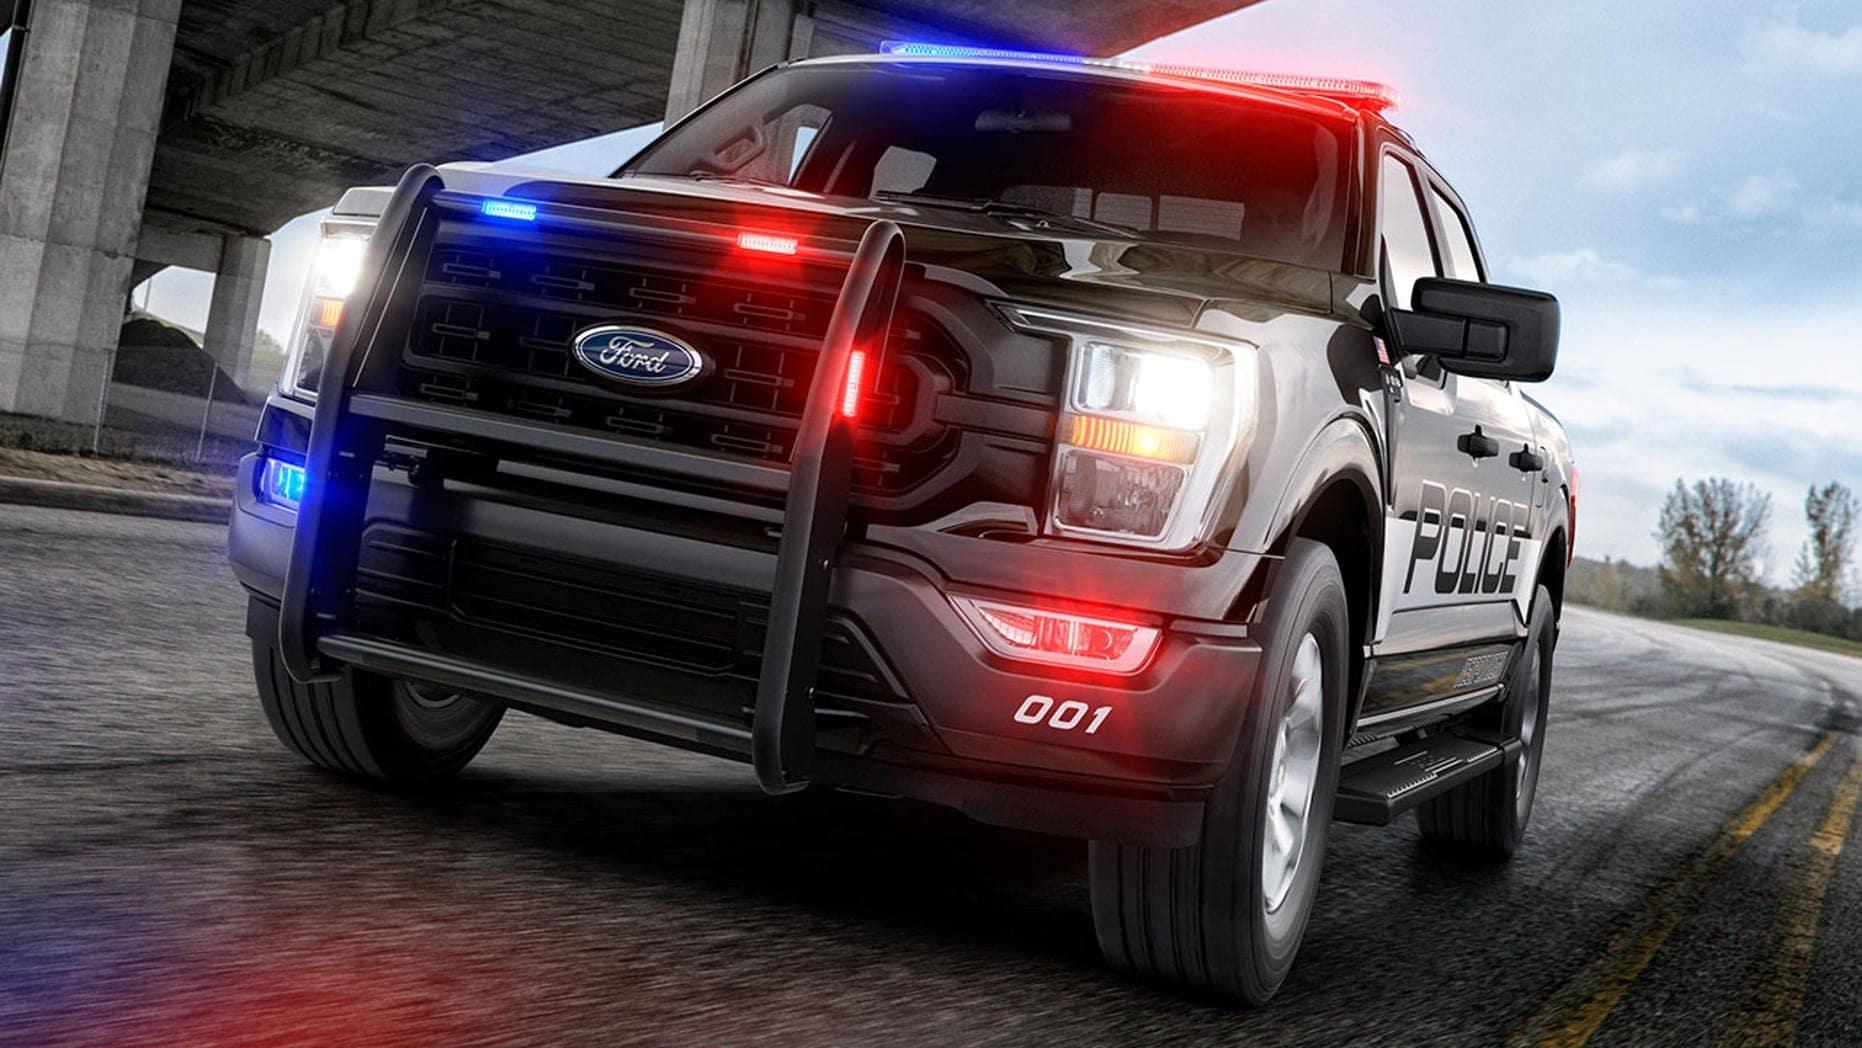 2021 Ford F-150 Responder